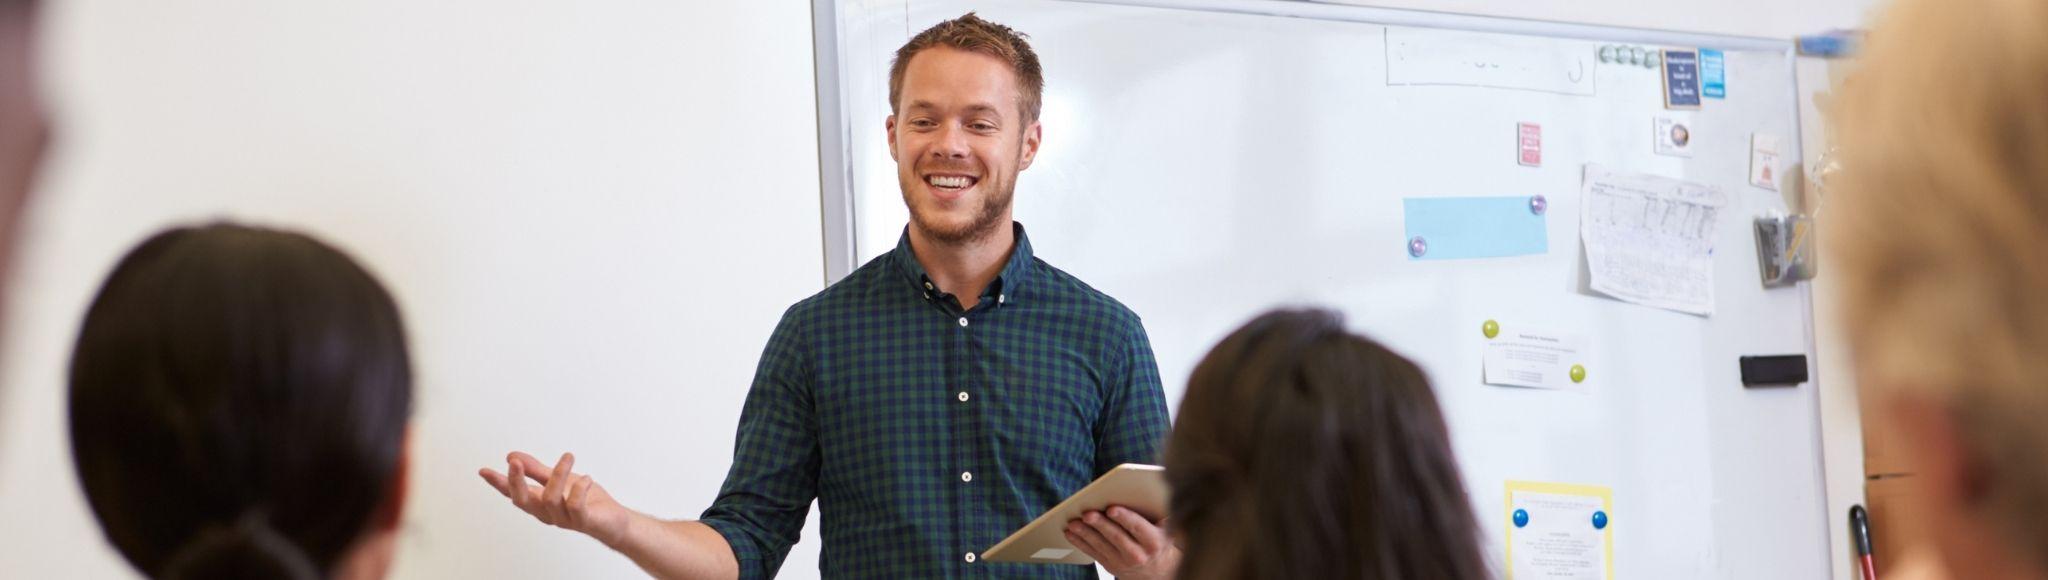 Male teacher TEFL